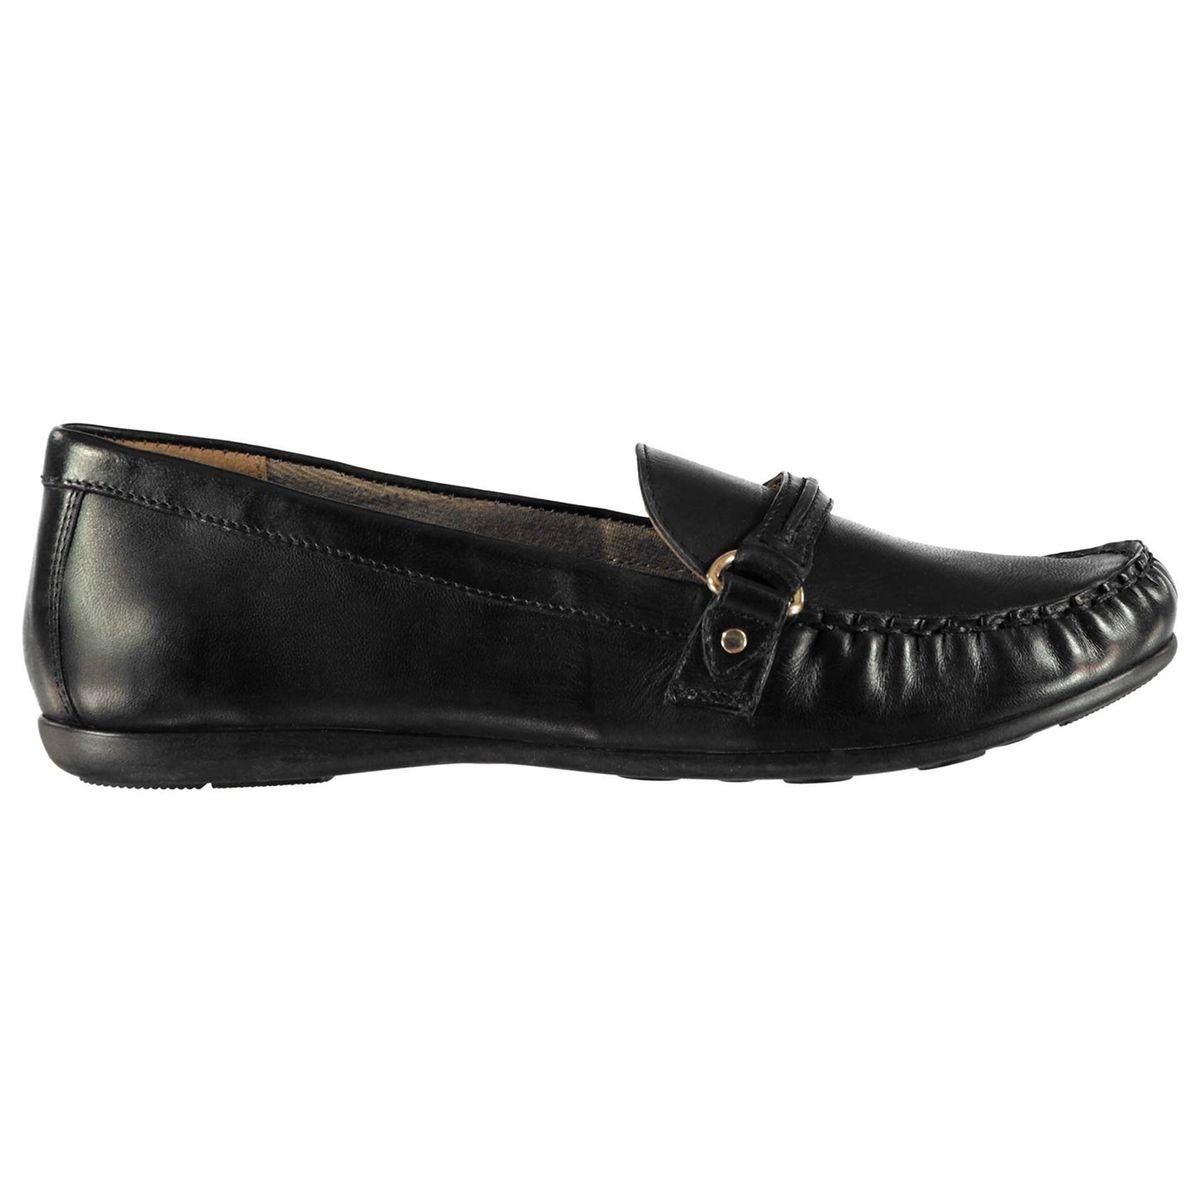 Chaussures mocassins en cuir